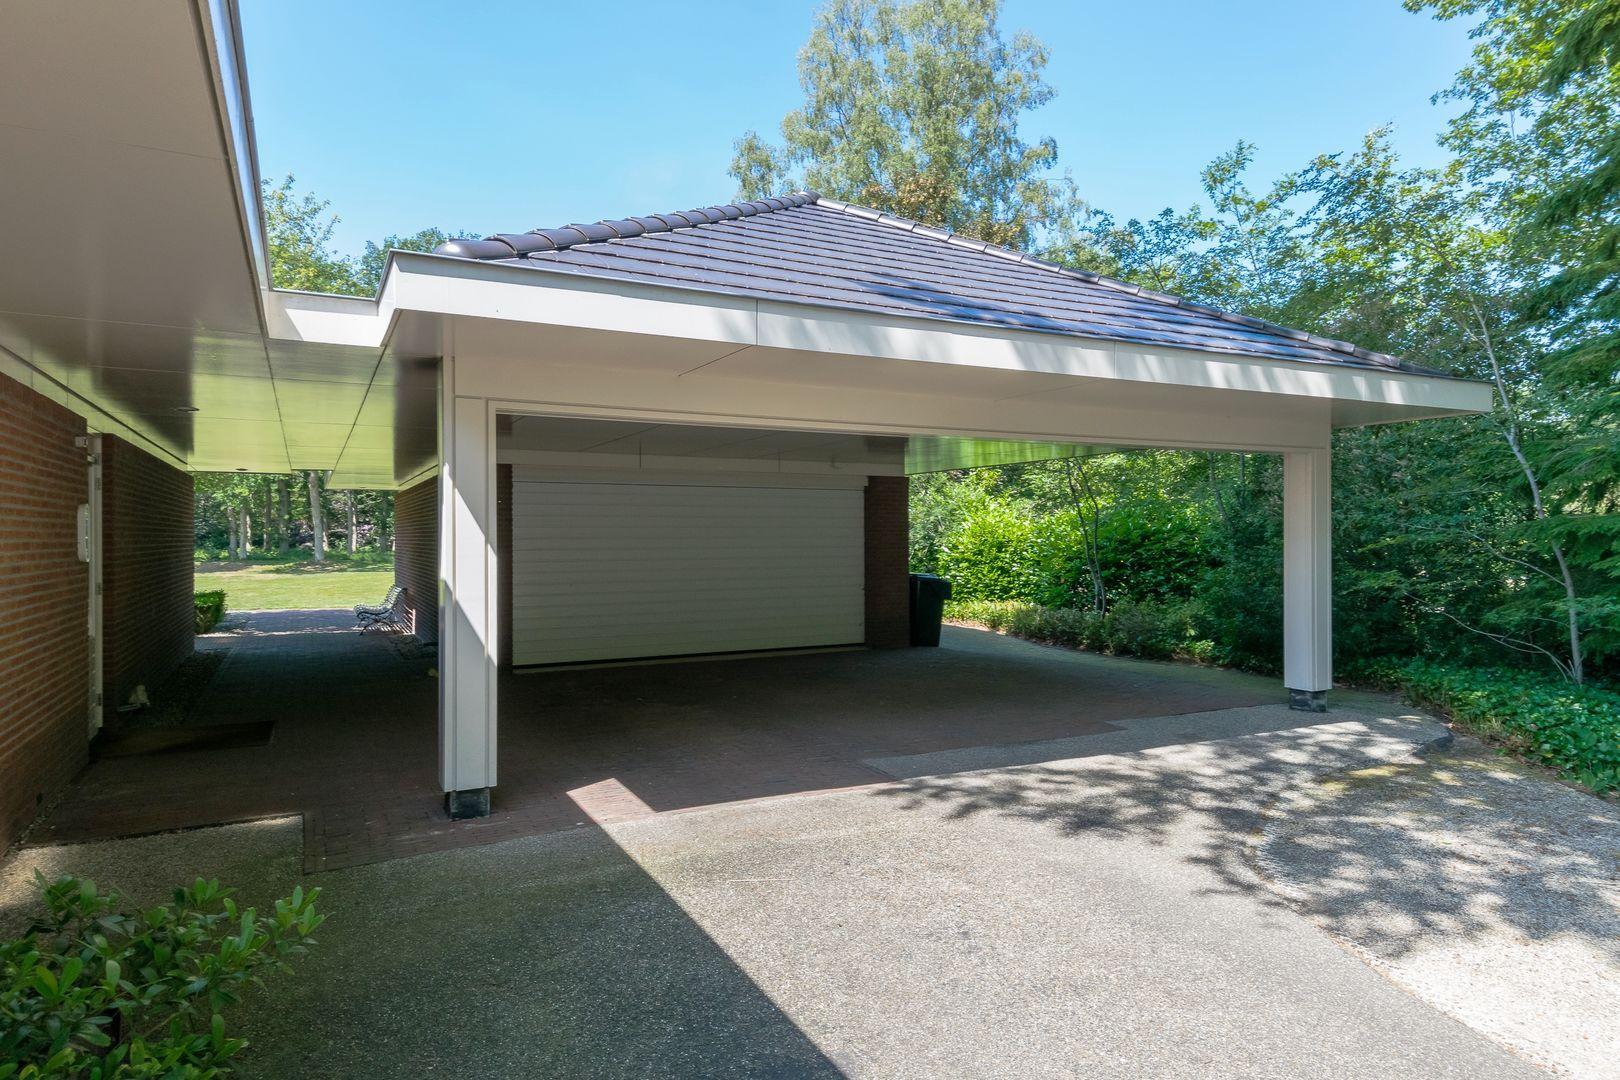 Helomapark 10, Beetsterzwaag foto-